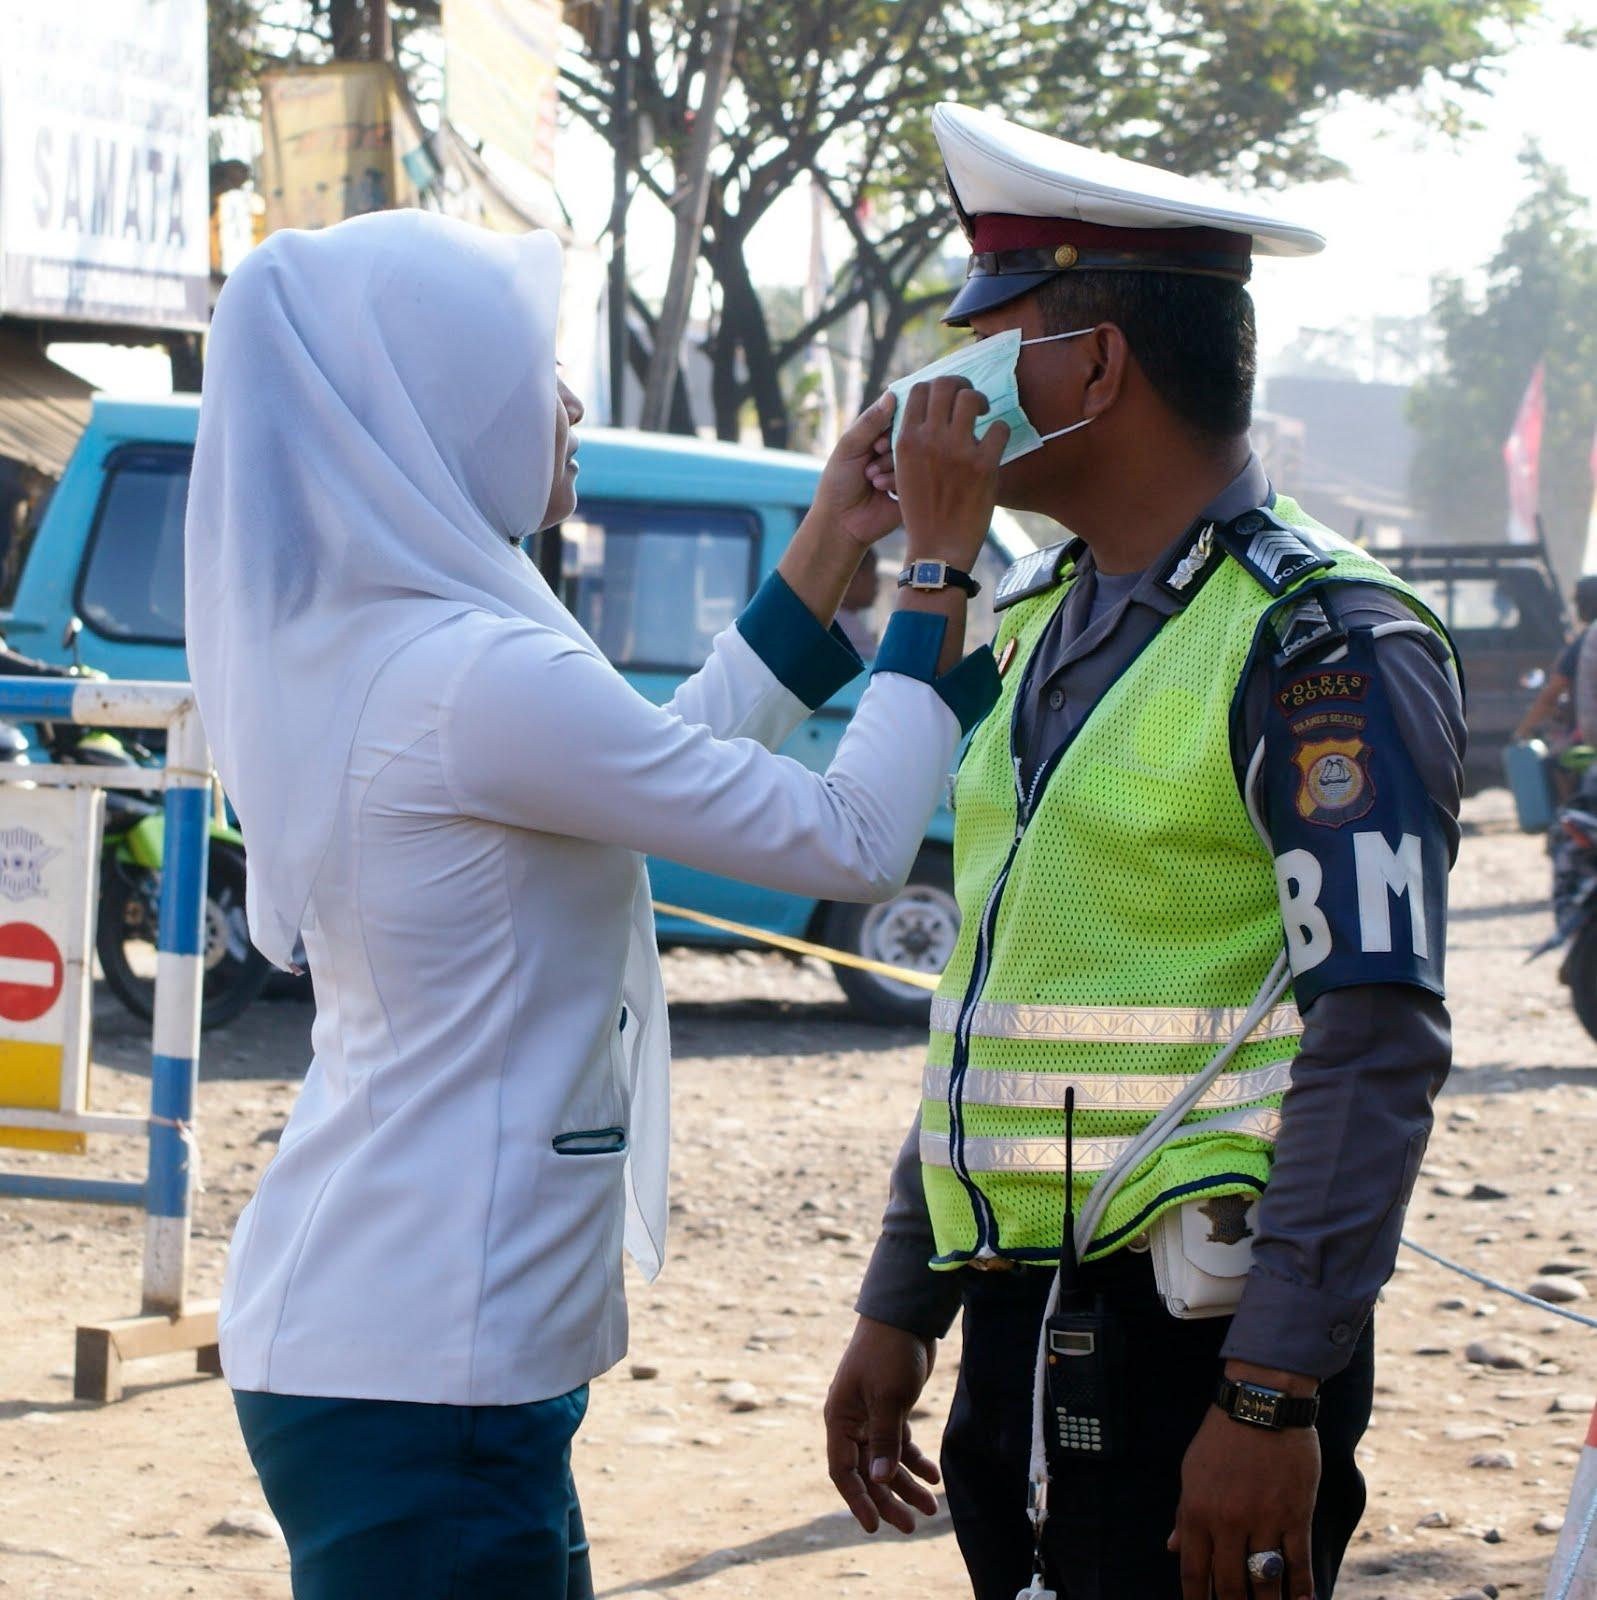 Kumpulan Gambar Dp Bbm Istri Polisi Terlengkap Top Gambar